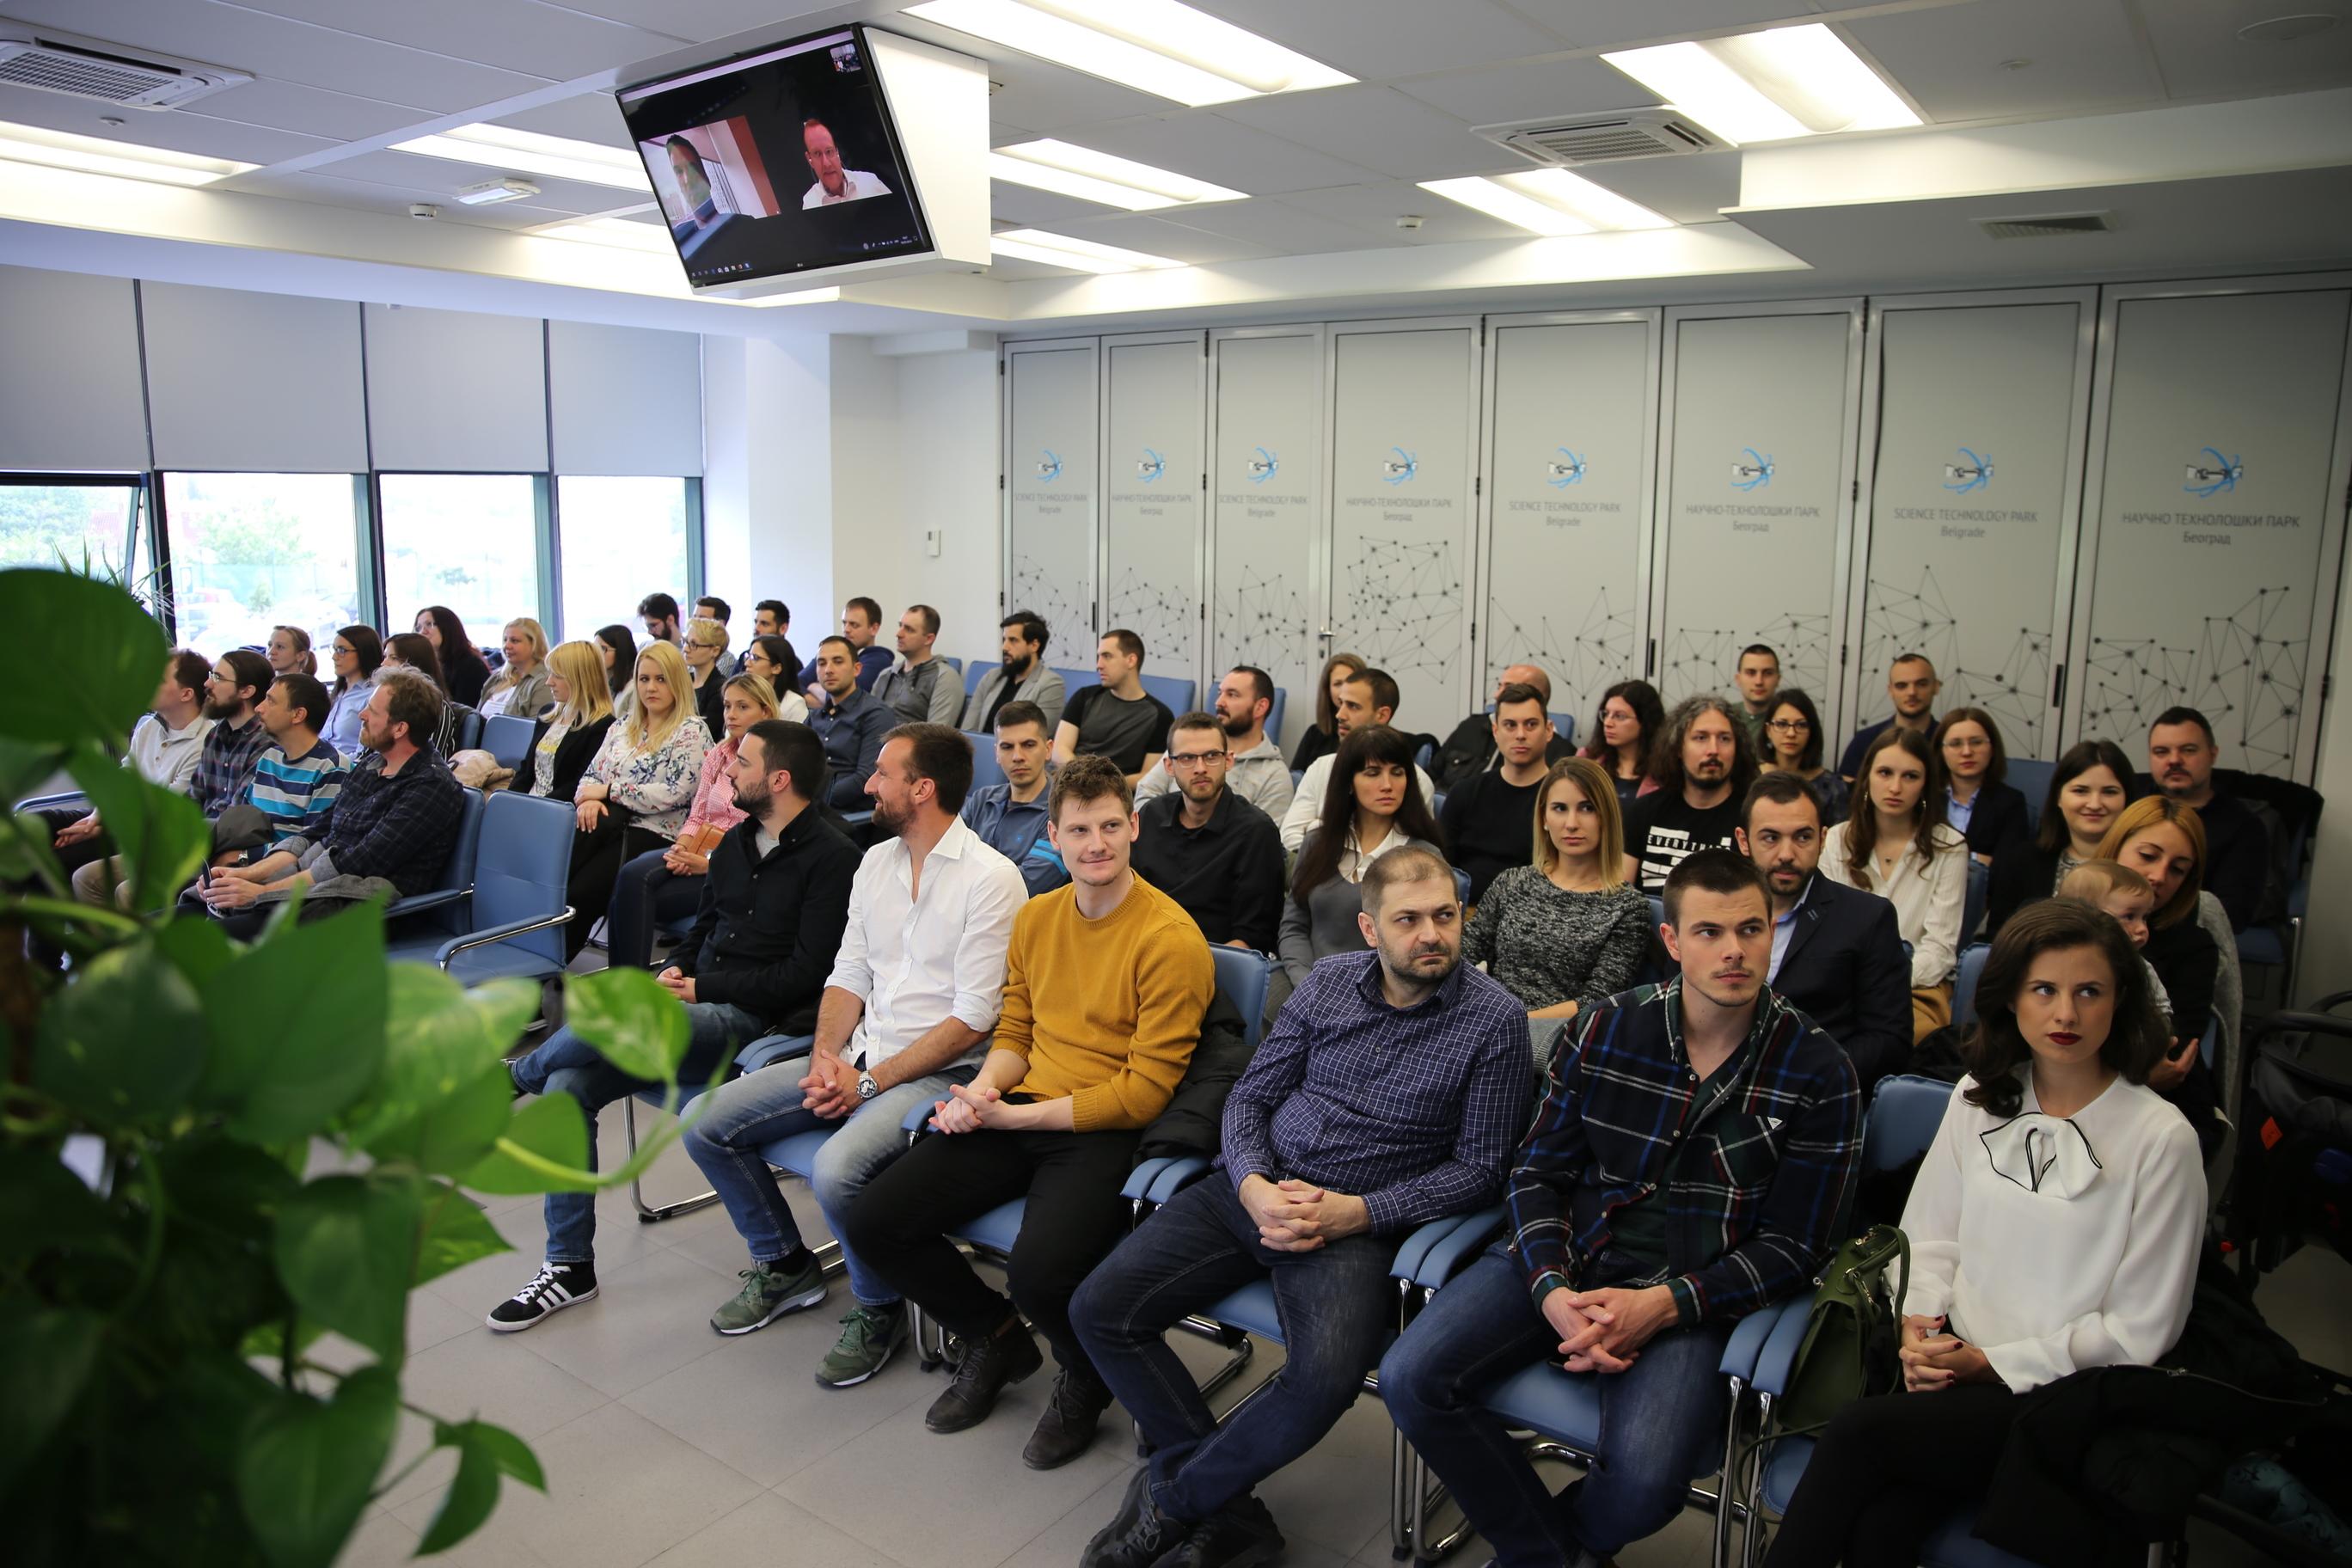 Održana dodela diploma trećoj generaciji polaznika IT Bootcamp-a